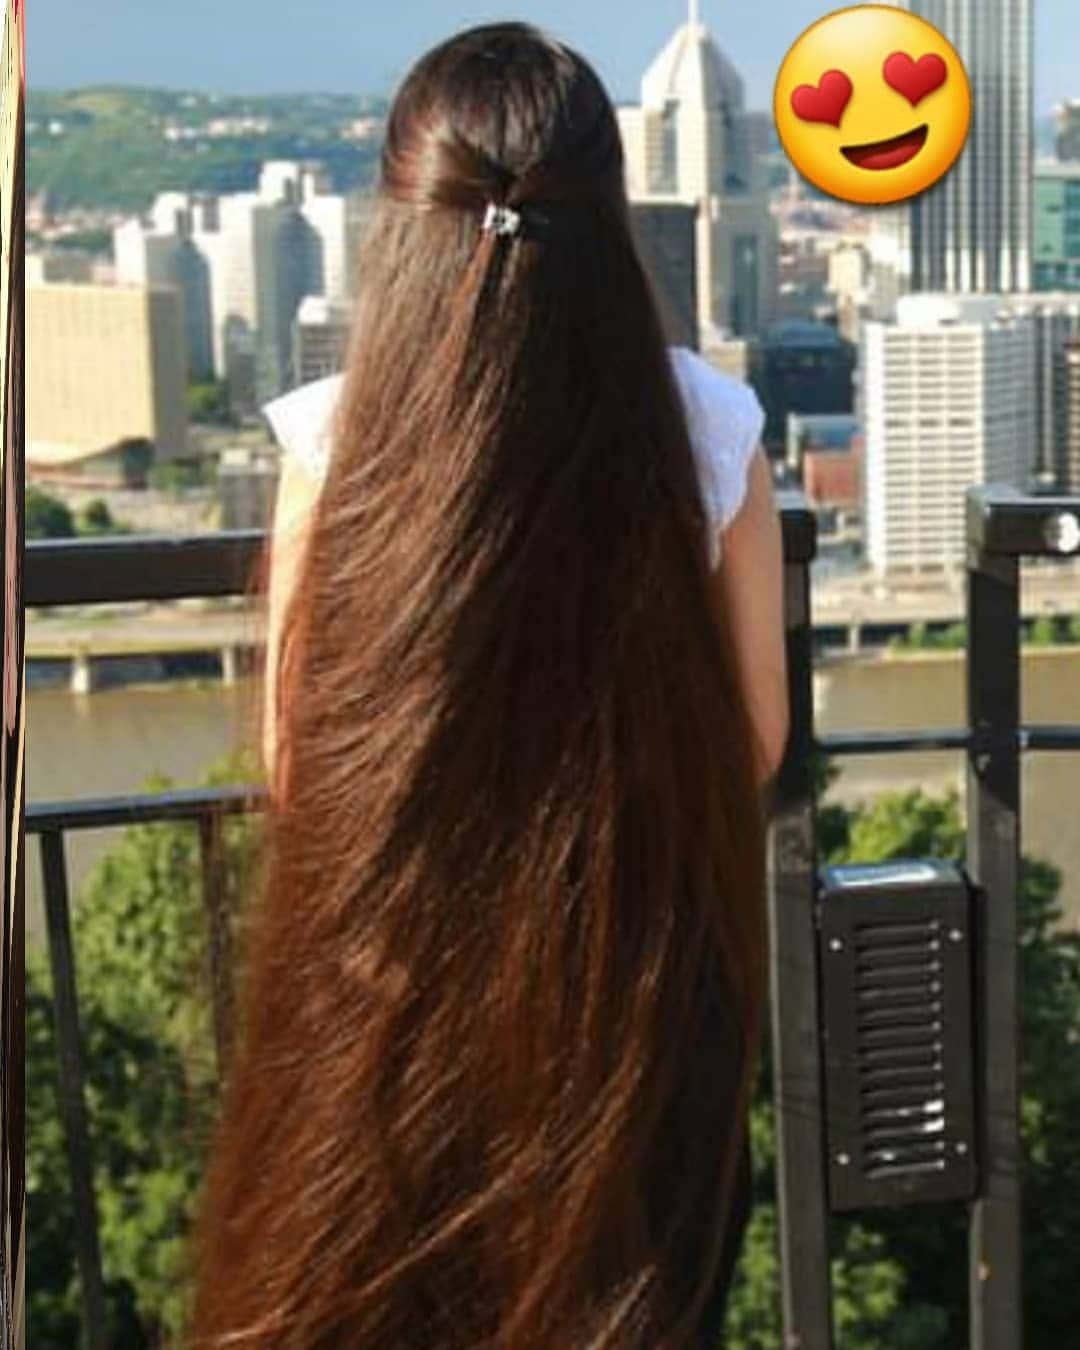 326 Likes 7 Comments Girl S Long Hair Ideal Wonder Girls Long Hair On Instagram World S Most Long Hair Styles Really Long Hair Hair Styles